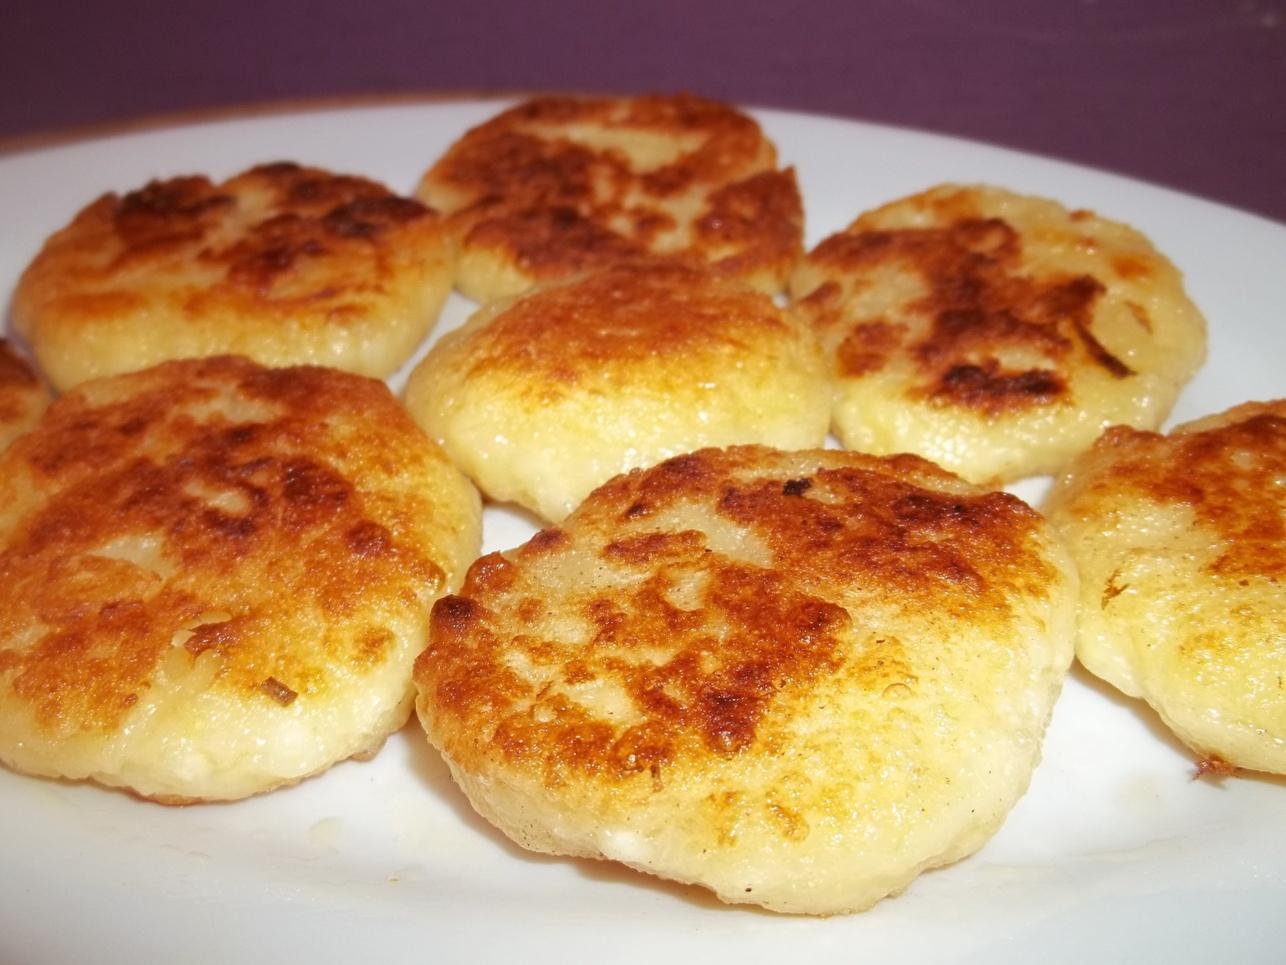 Сырники из творога 200 грамм творога рецепт